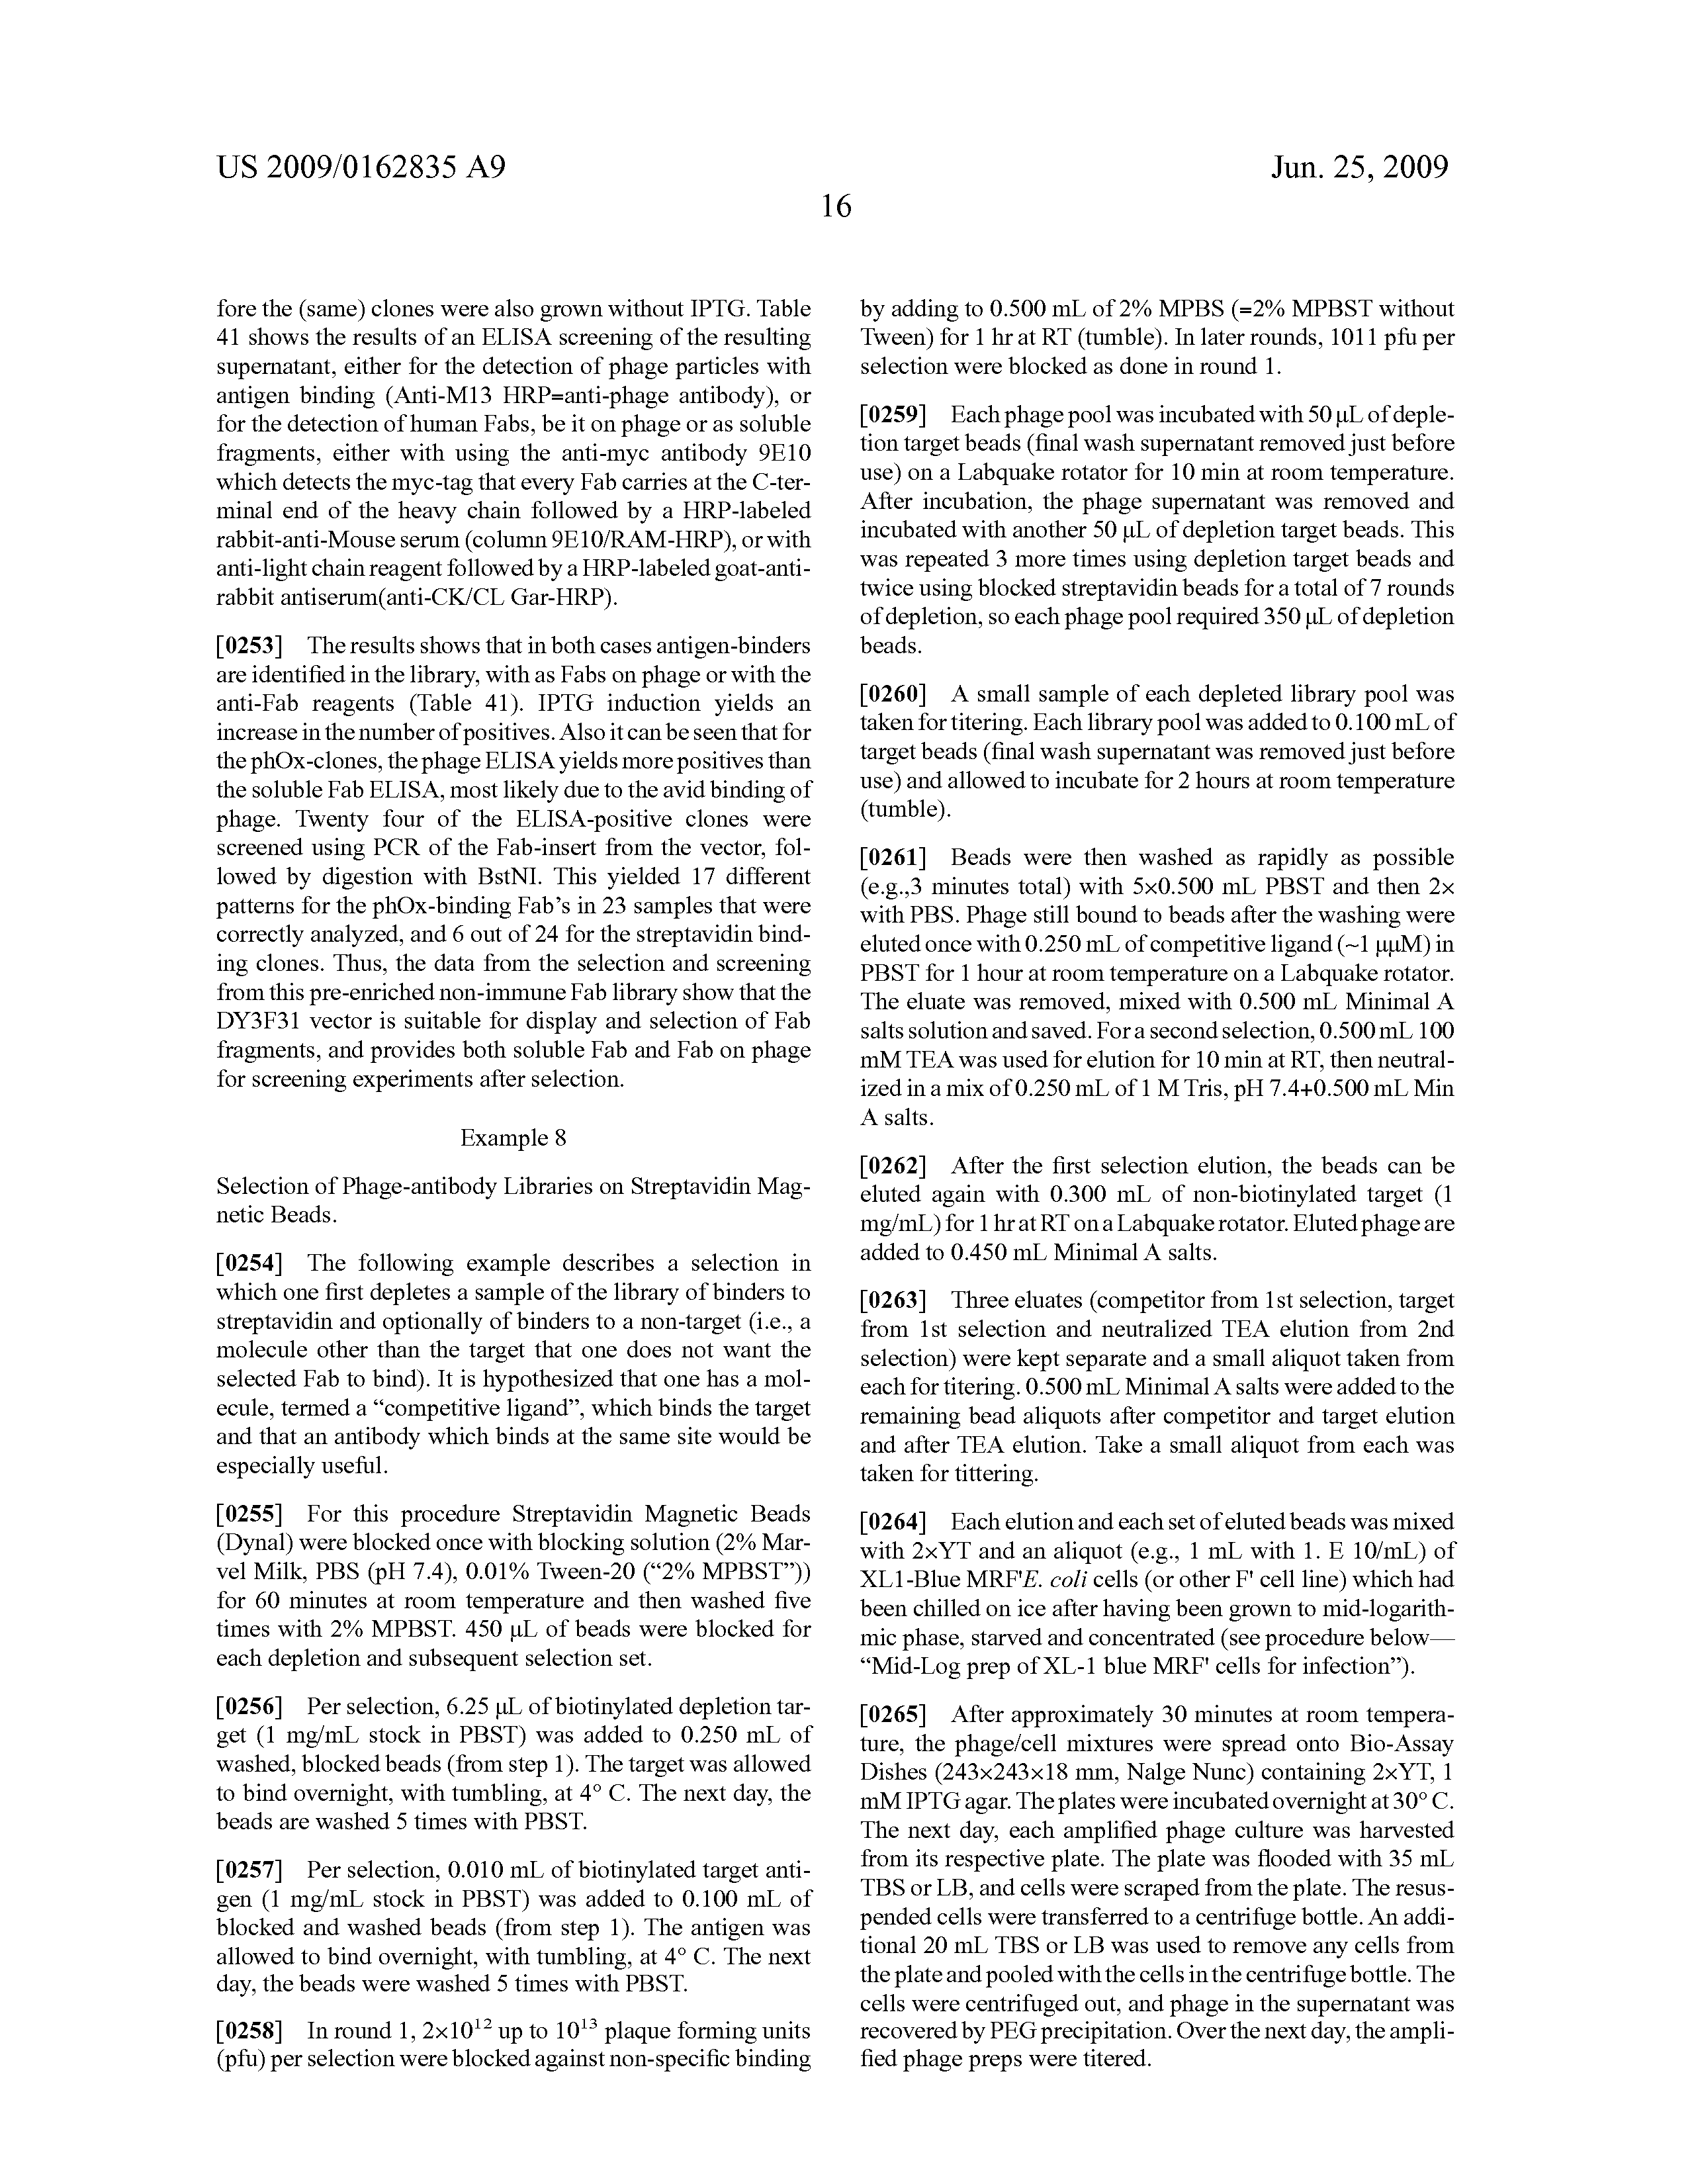 US 2009 0162835 A9 20090625 - Novel Methods Of Constructing